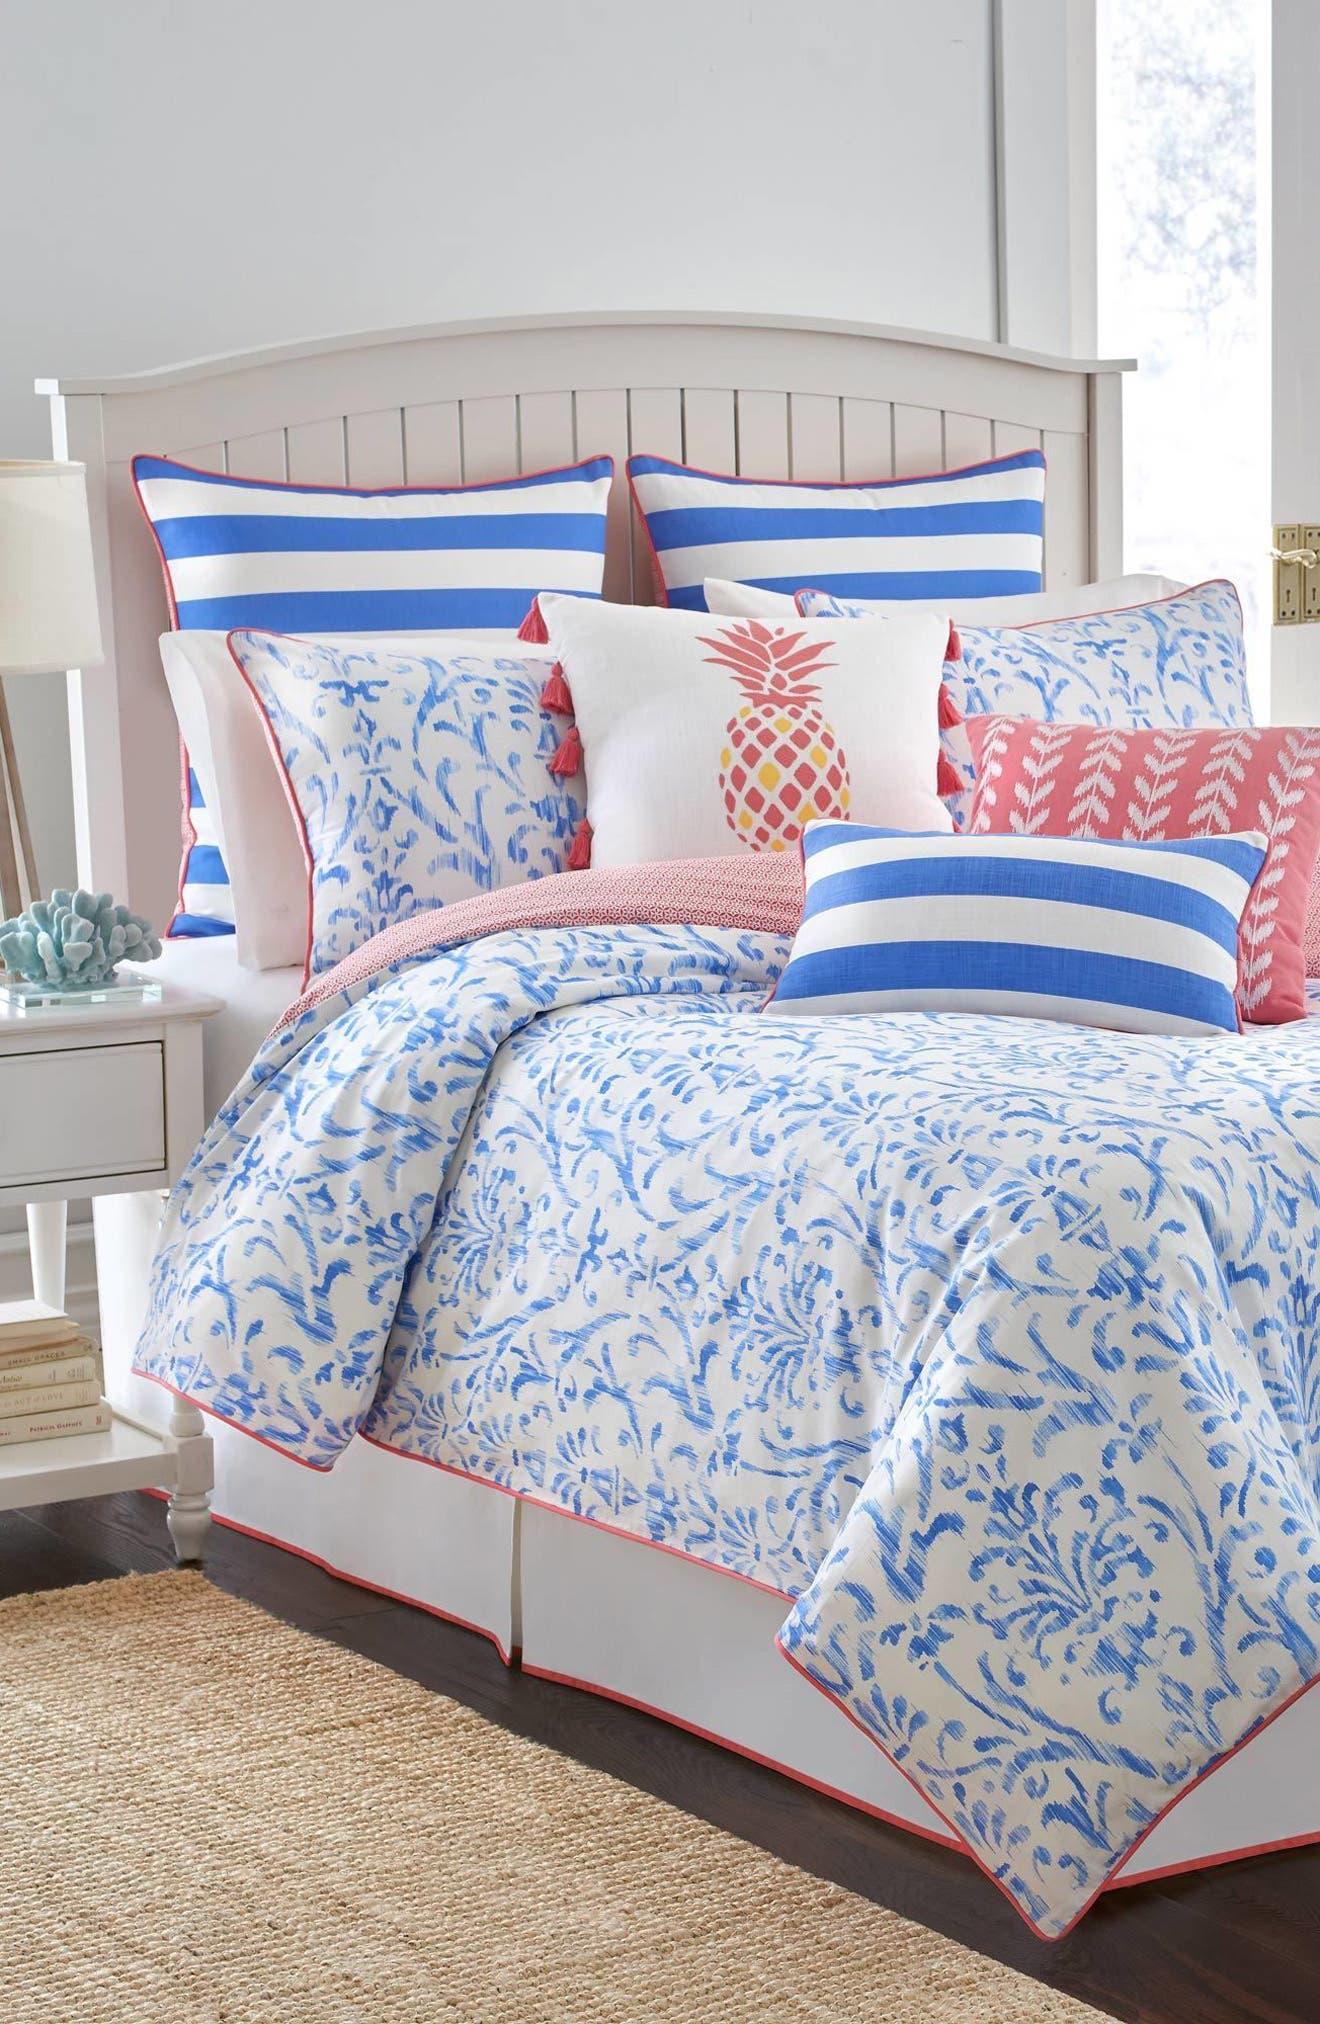 Coastal Ikat Comforter, Sham & Bed Skirt Set,                             Main thumbnail 1, color,                             400